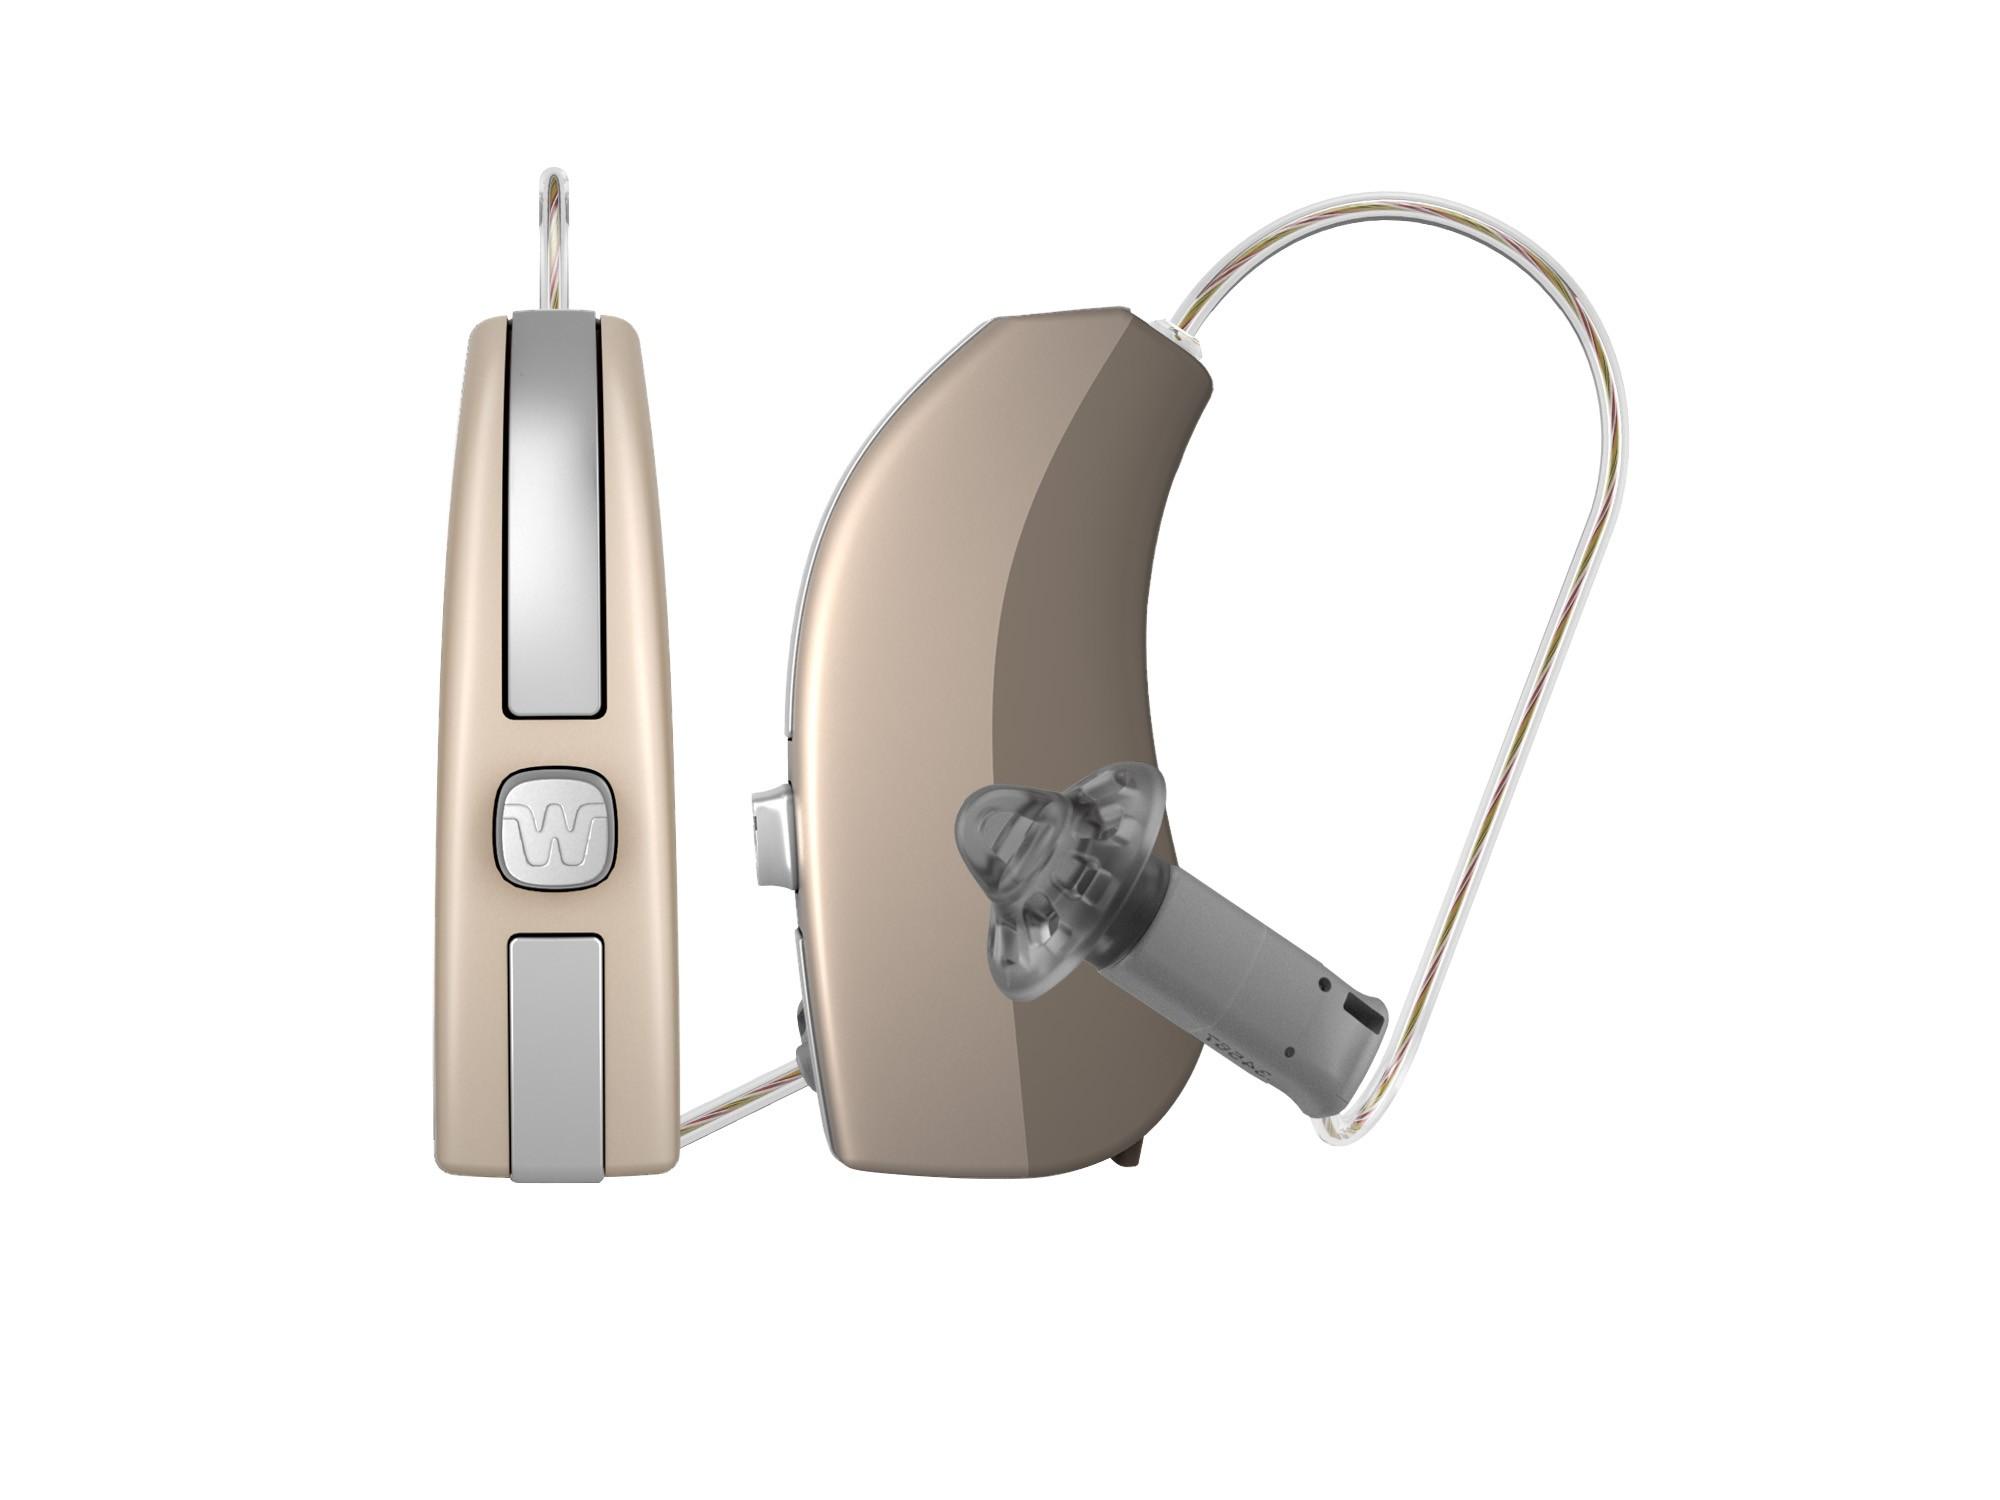 Widex Beyond 330 Hearing Aid